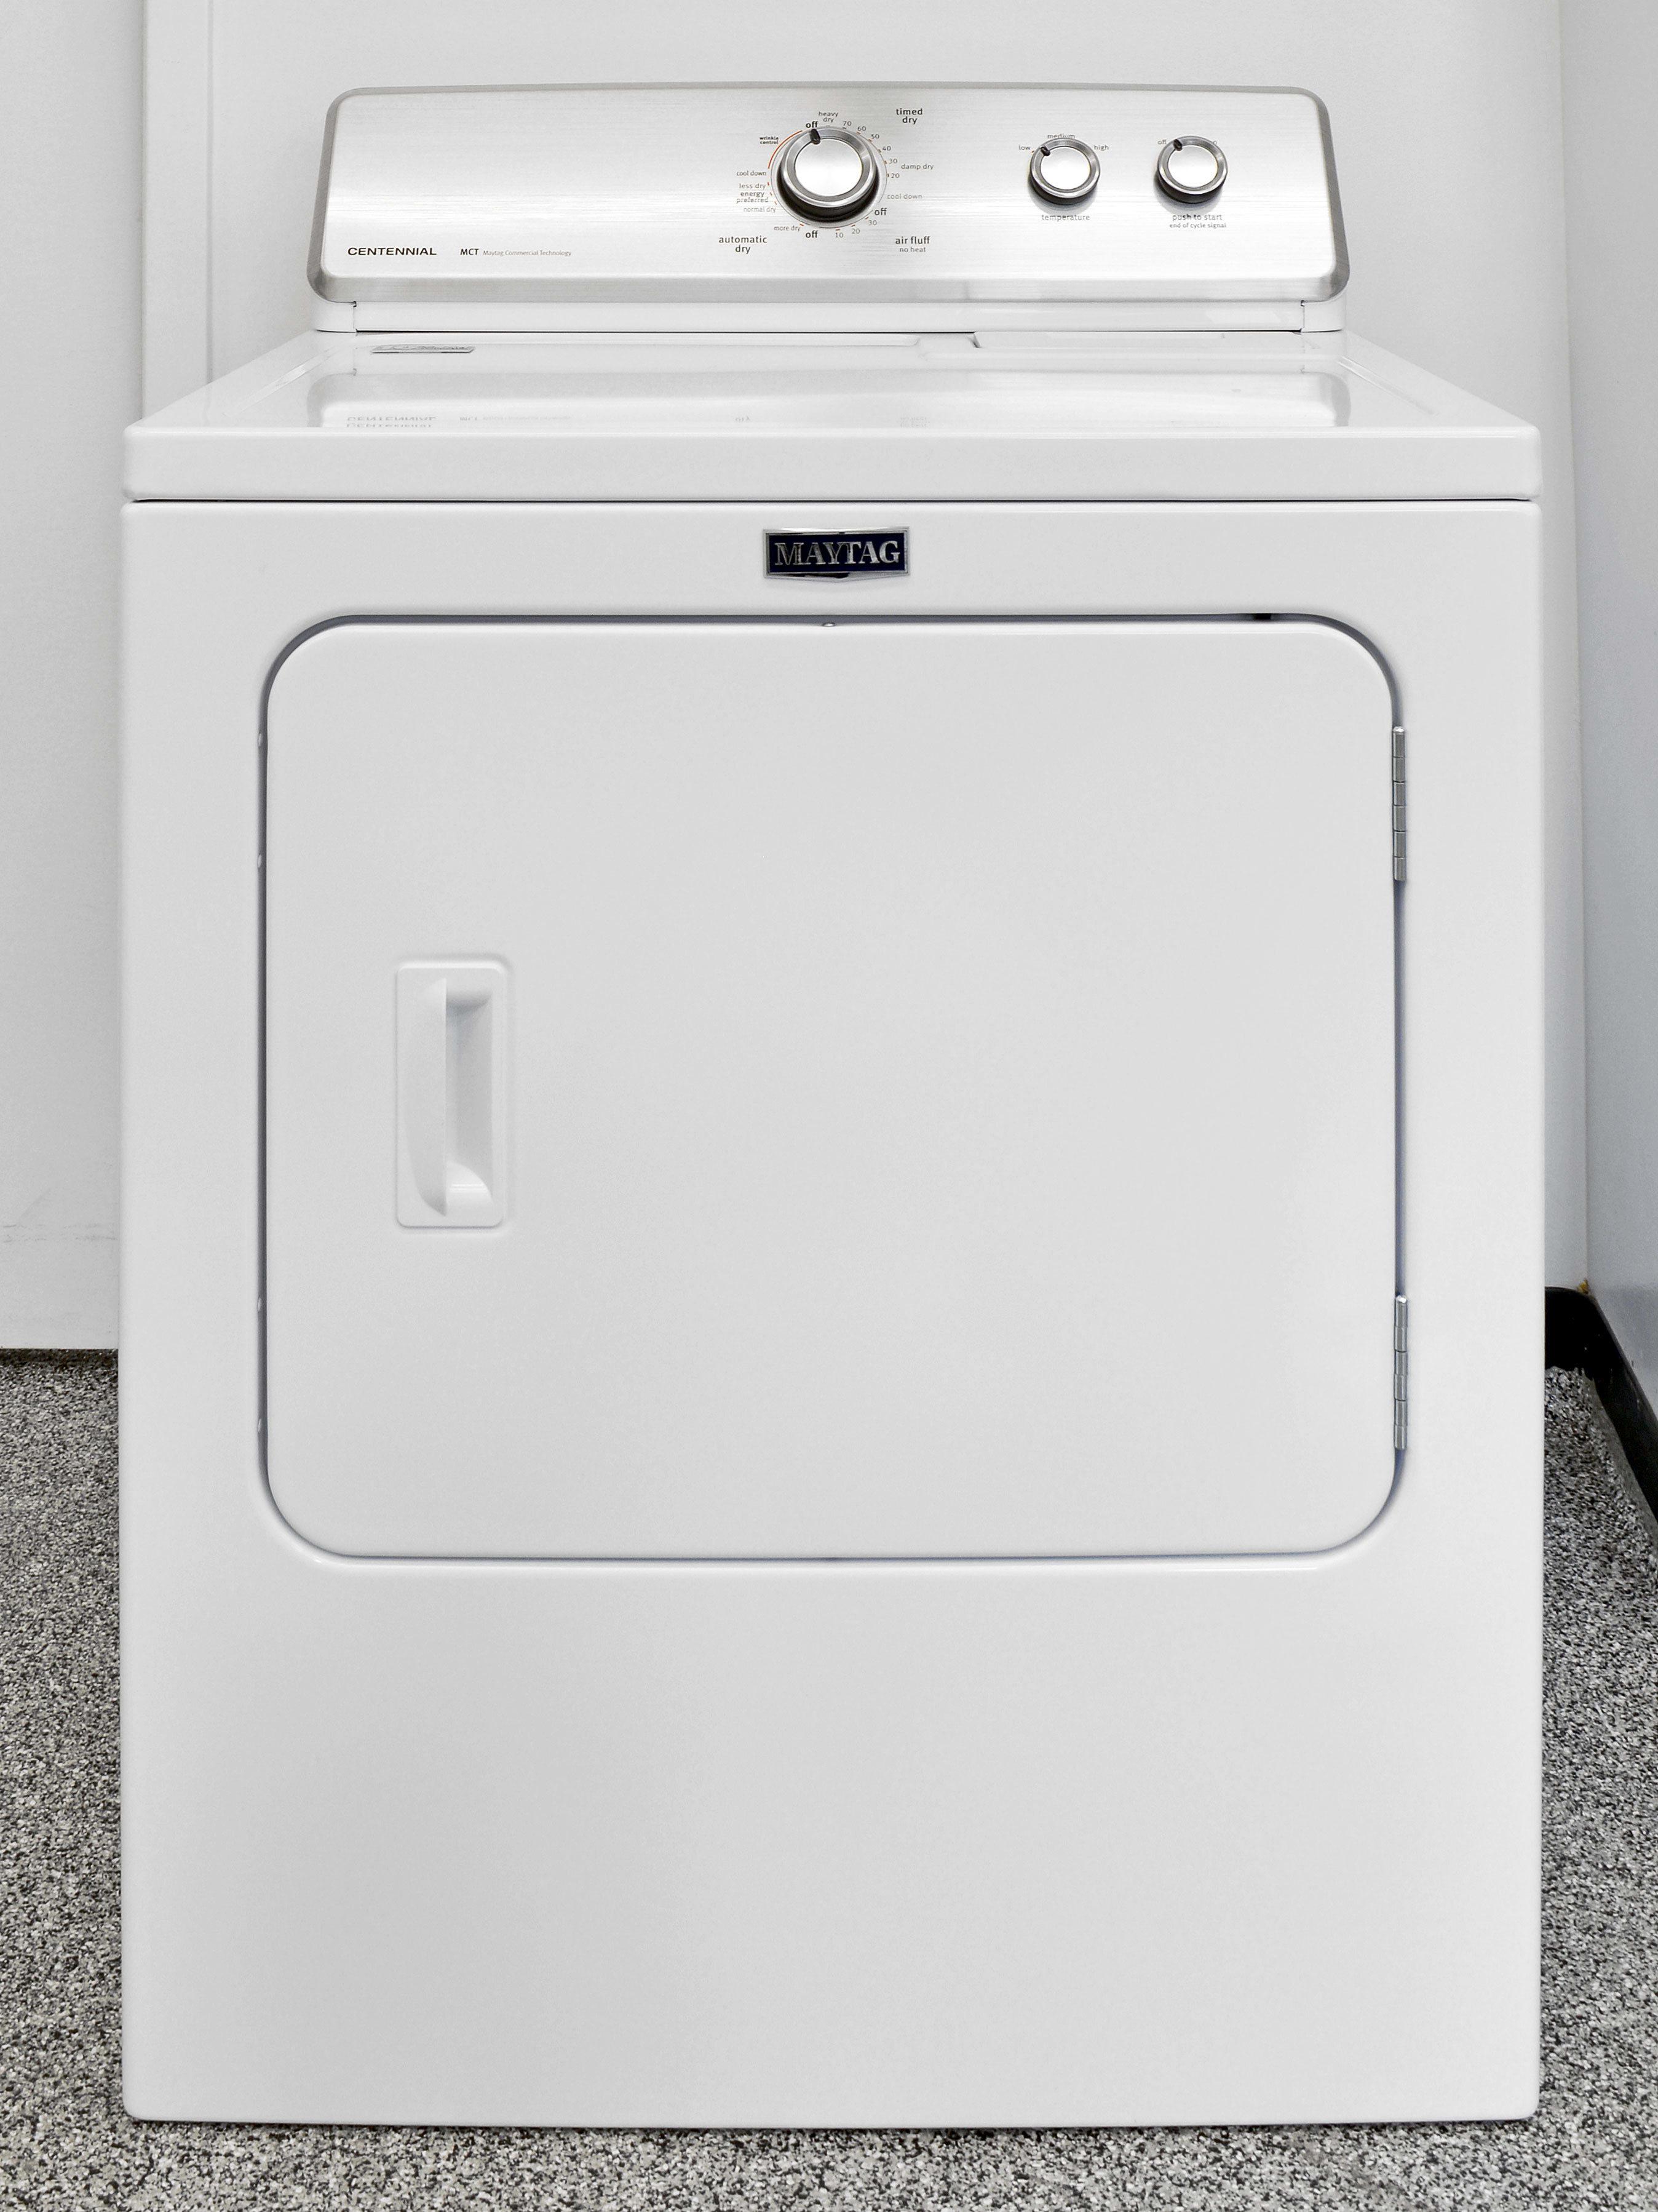 The Maytag Centennial MEDC215EW is a basic, budget-friendly white good appliance.